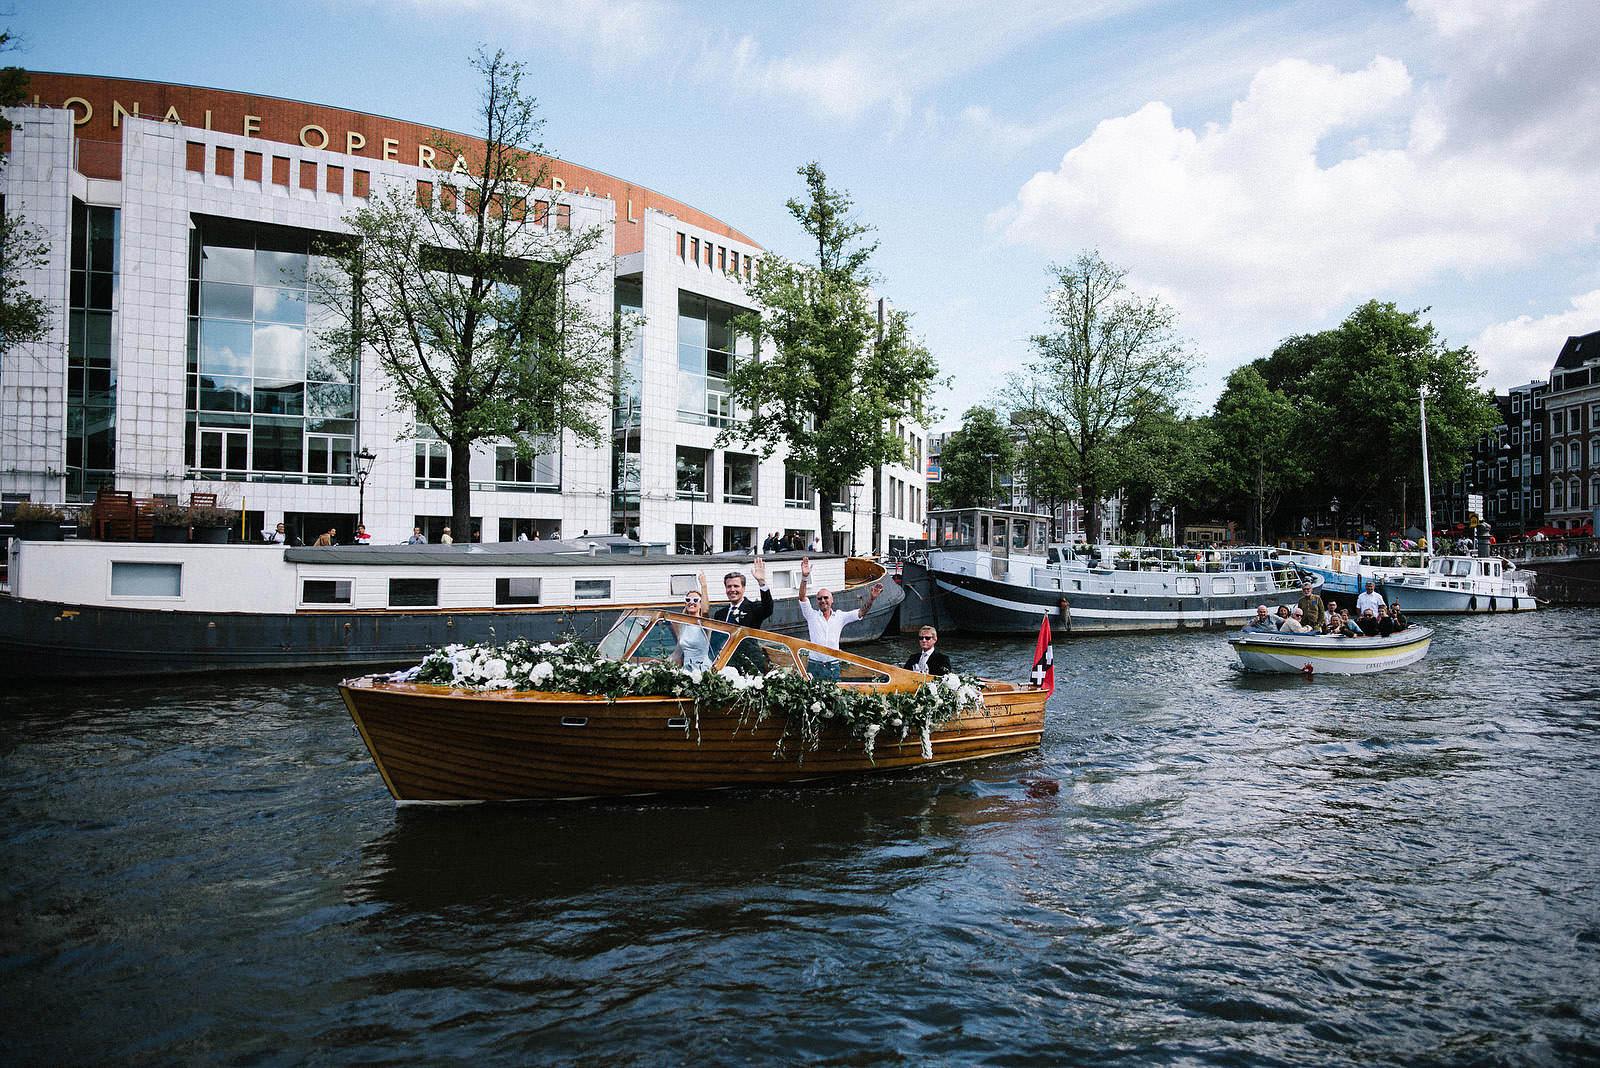 Fotograf Konstanz - Destination Wedding Photographer Amsterdam 055 - Destination Wedding Amsterdam  - 164 -